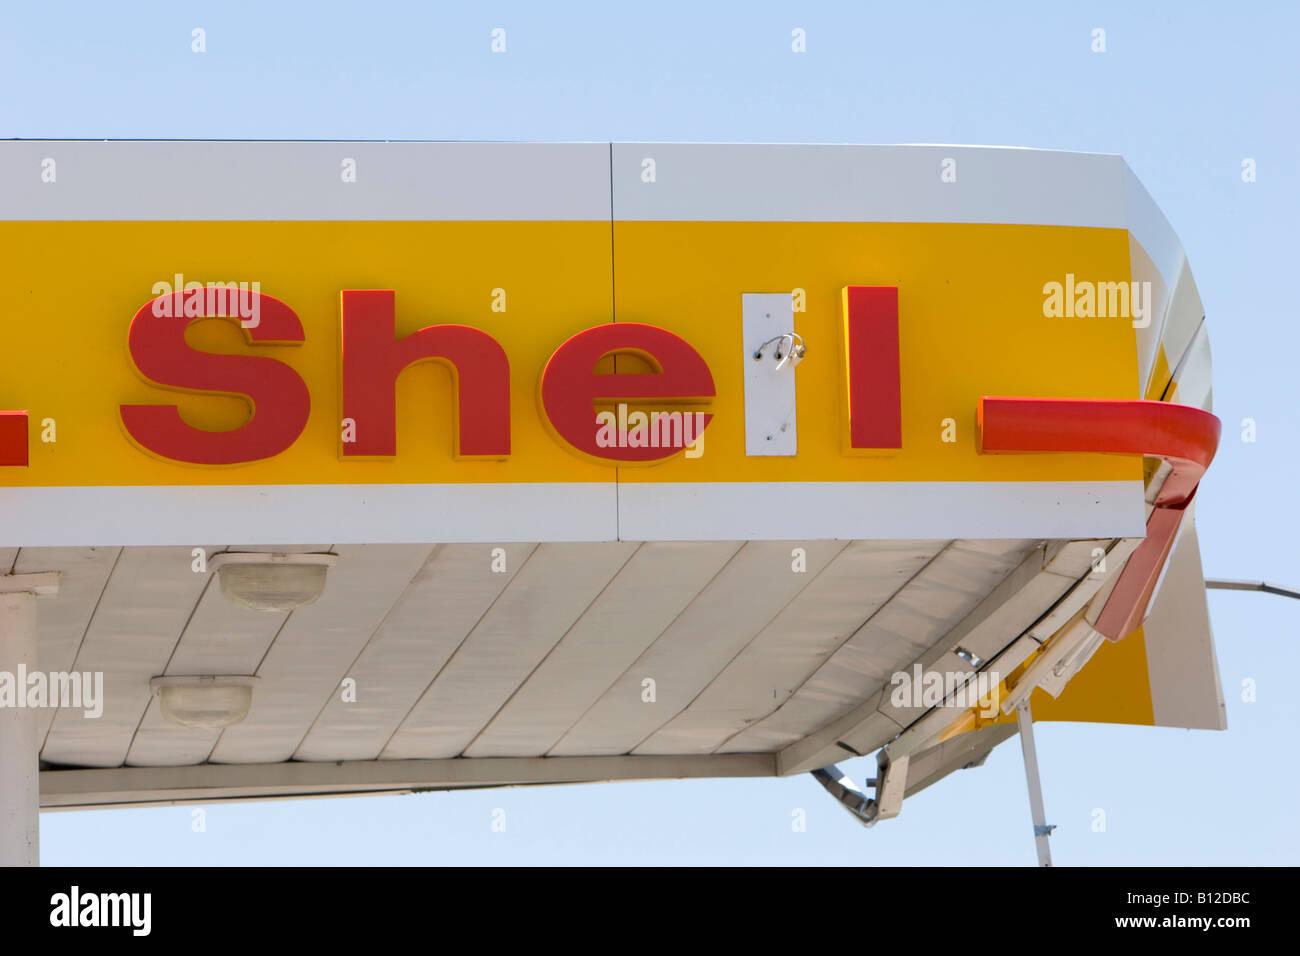 A Shell gas station awning damaged in a tornado.  Aurora, Nebraska, May 29, 2008. - Stock Image